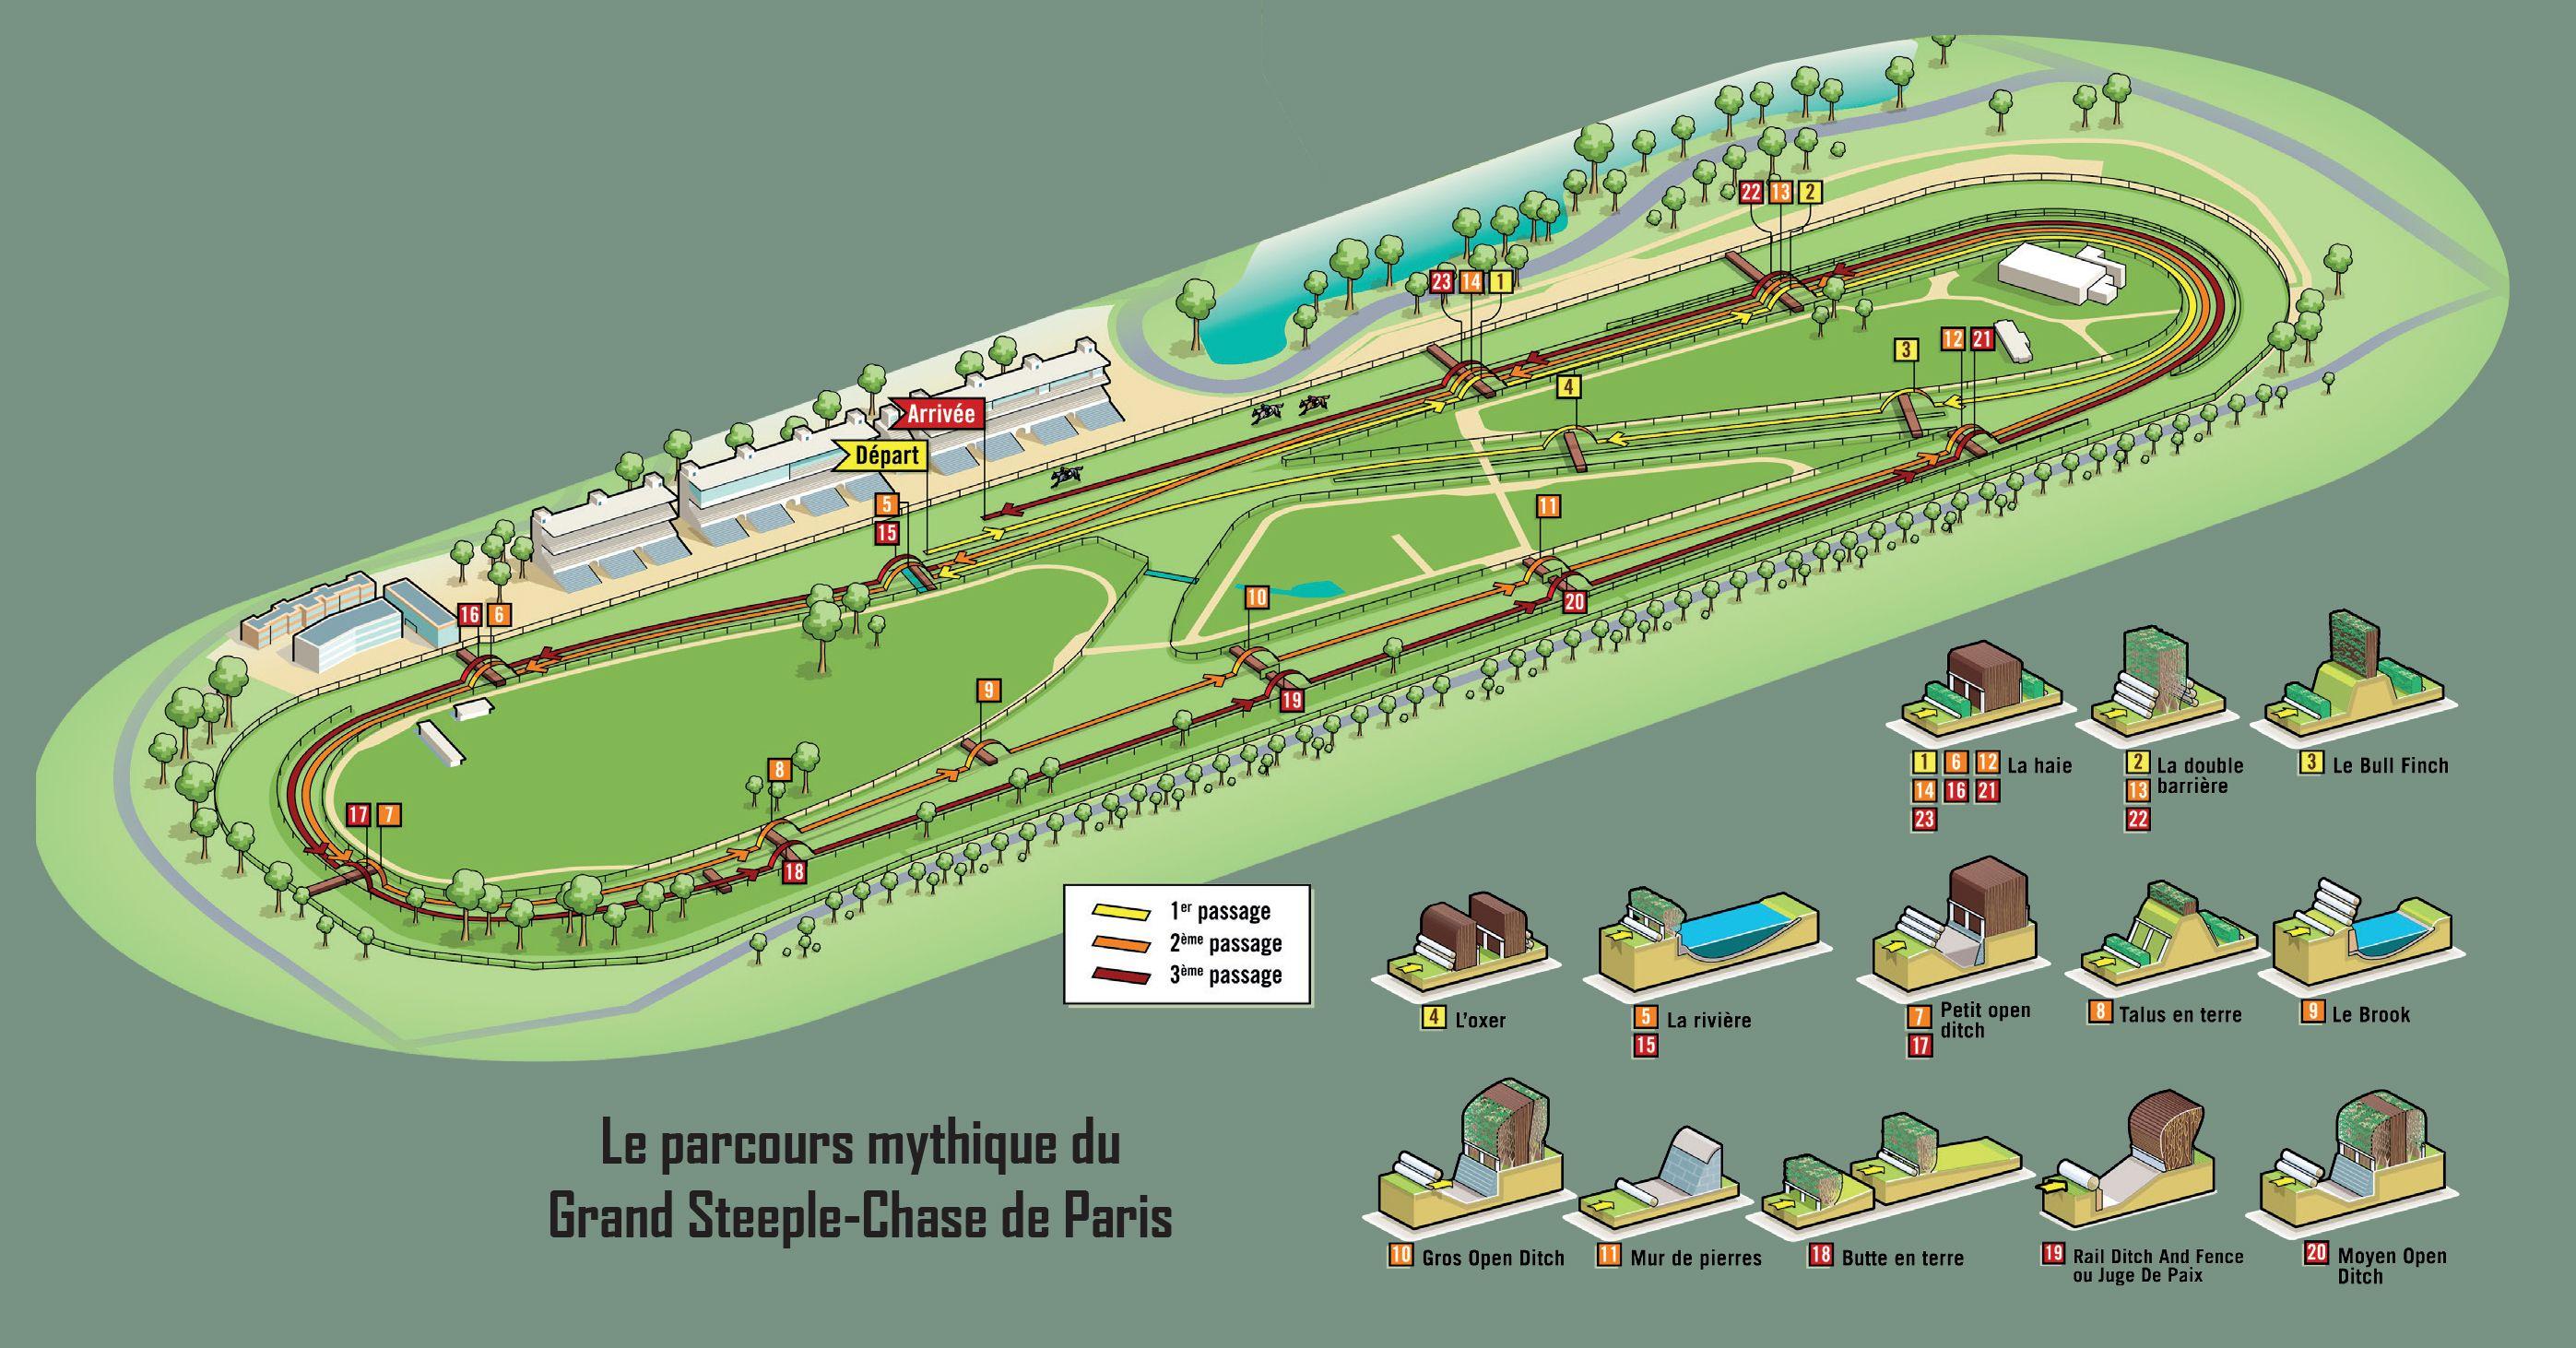 parcours_Steeple_chase_paris.jpg